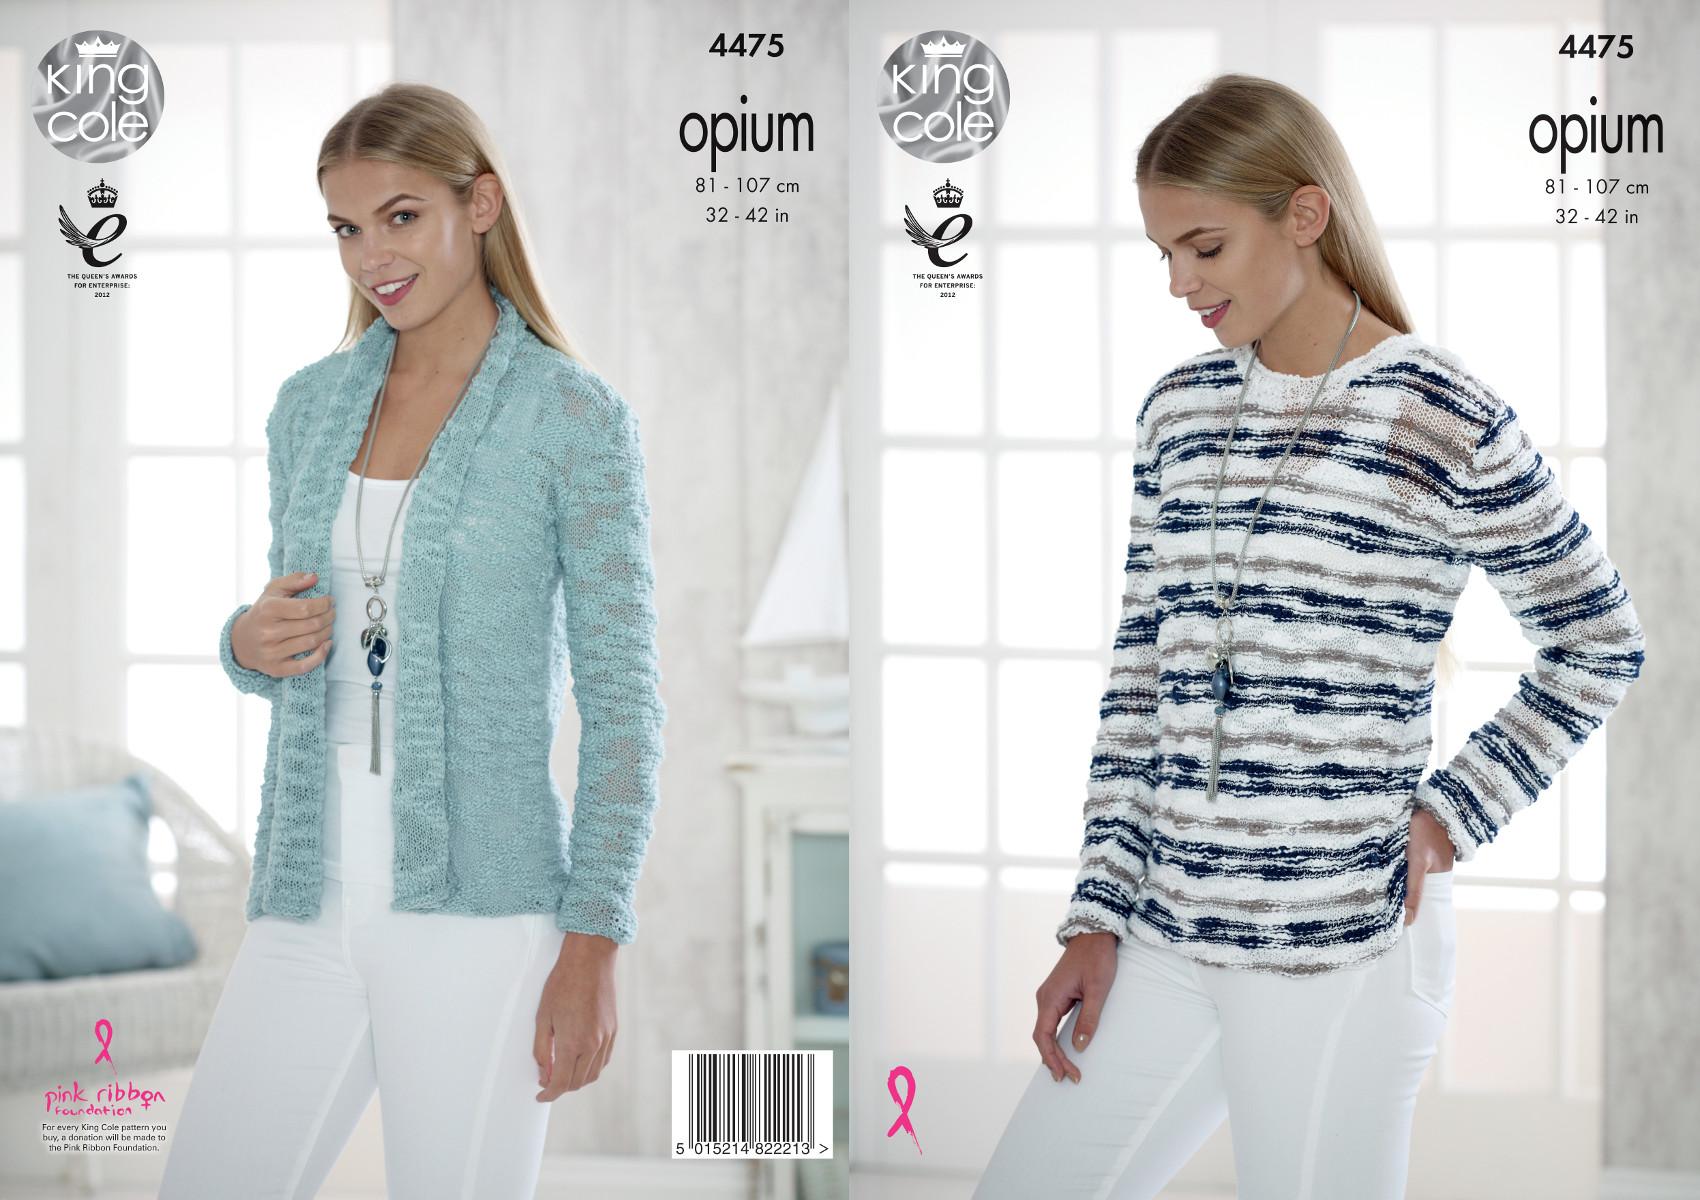 King Cole Ladies Sweaters Opium Knitting Pattern 4825 KCP-4825